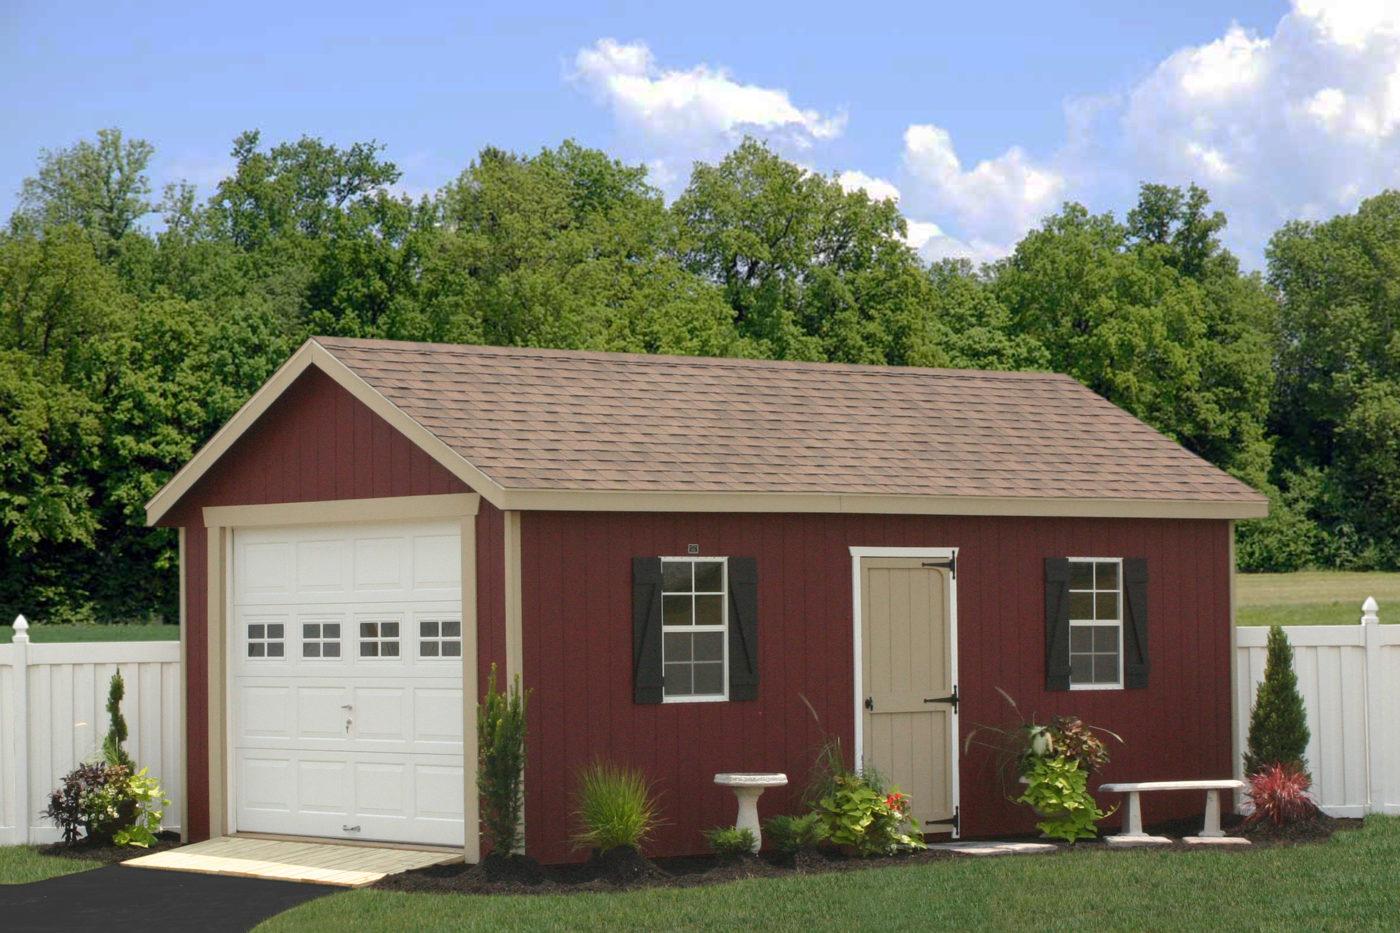 12x24 single car garages for sale